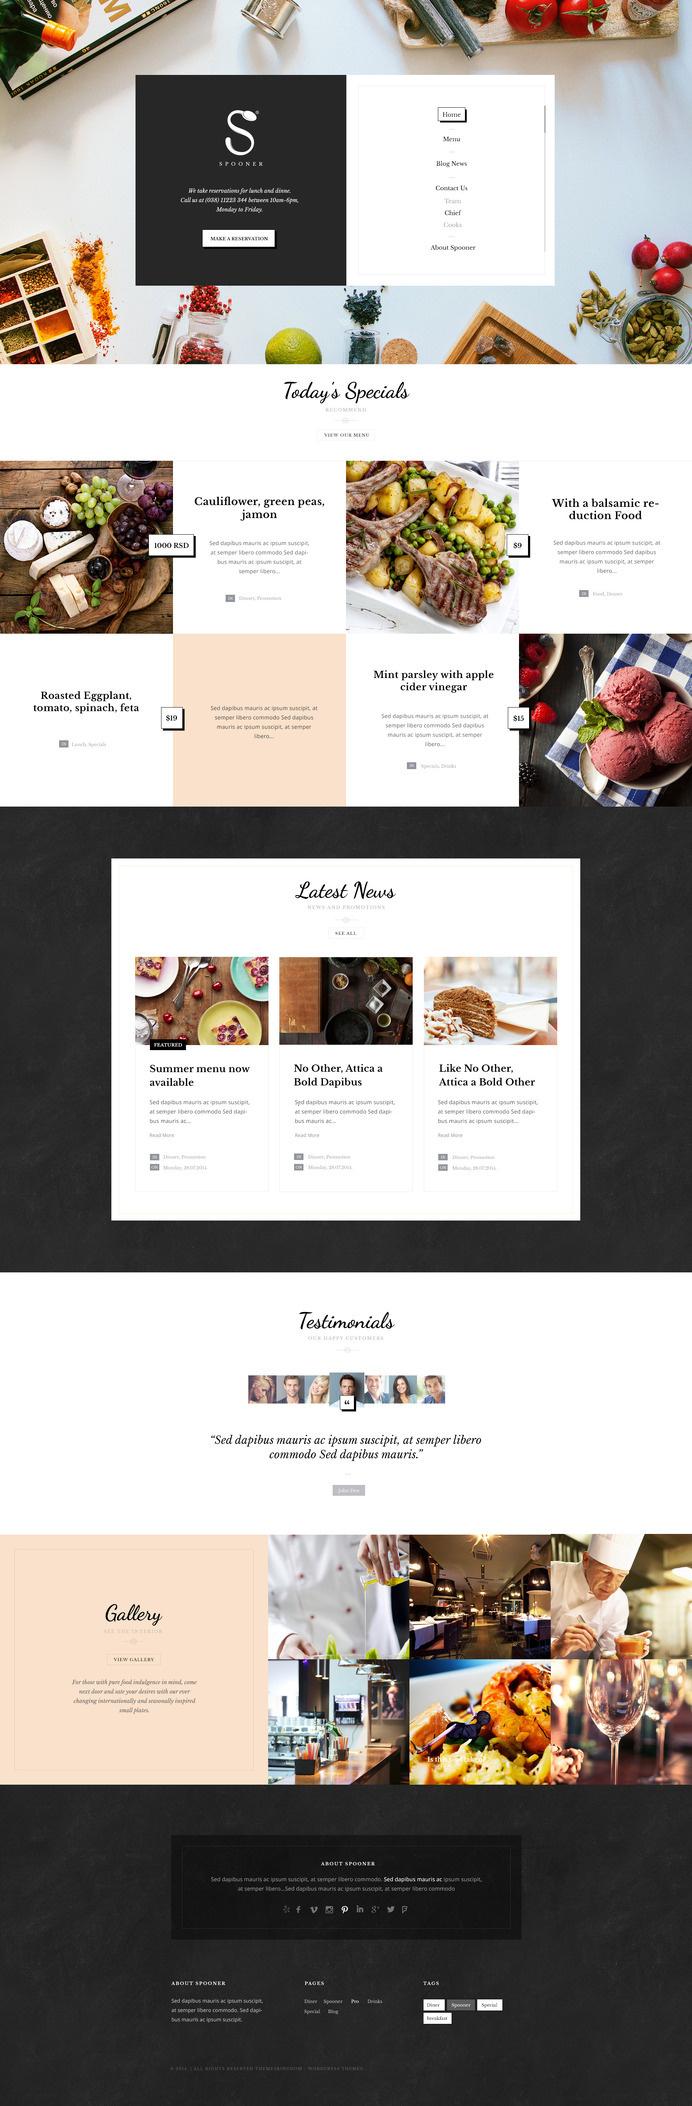 Spooner – Restaurant & Bar WordPress Theme #web design #restaurant #bar wordpress theme